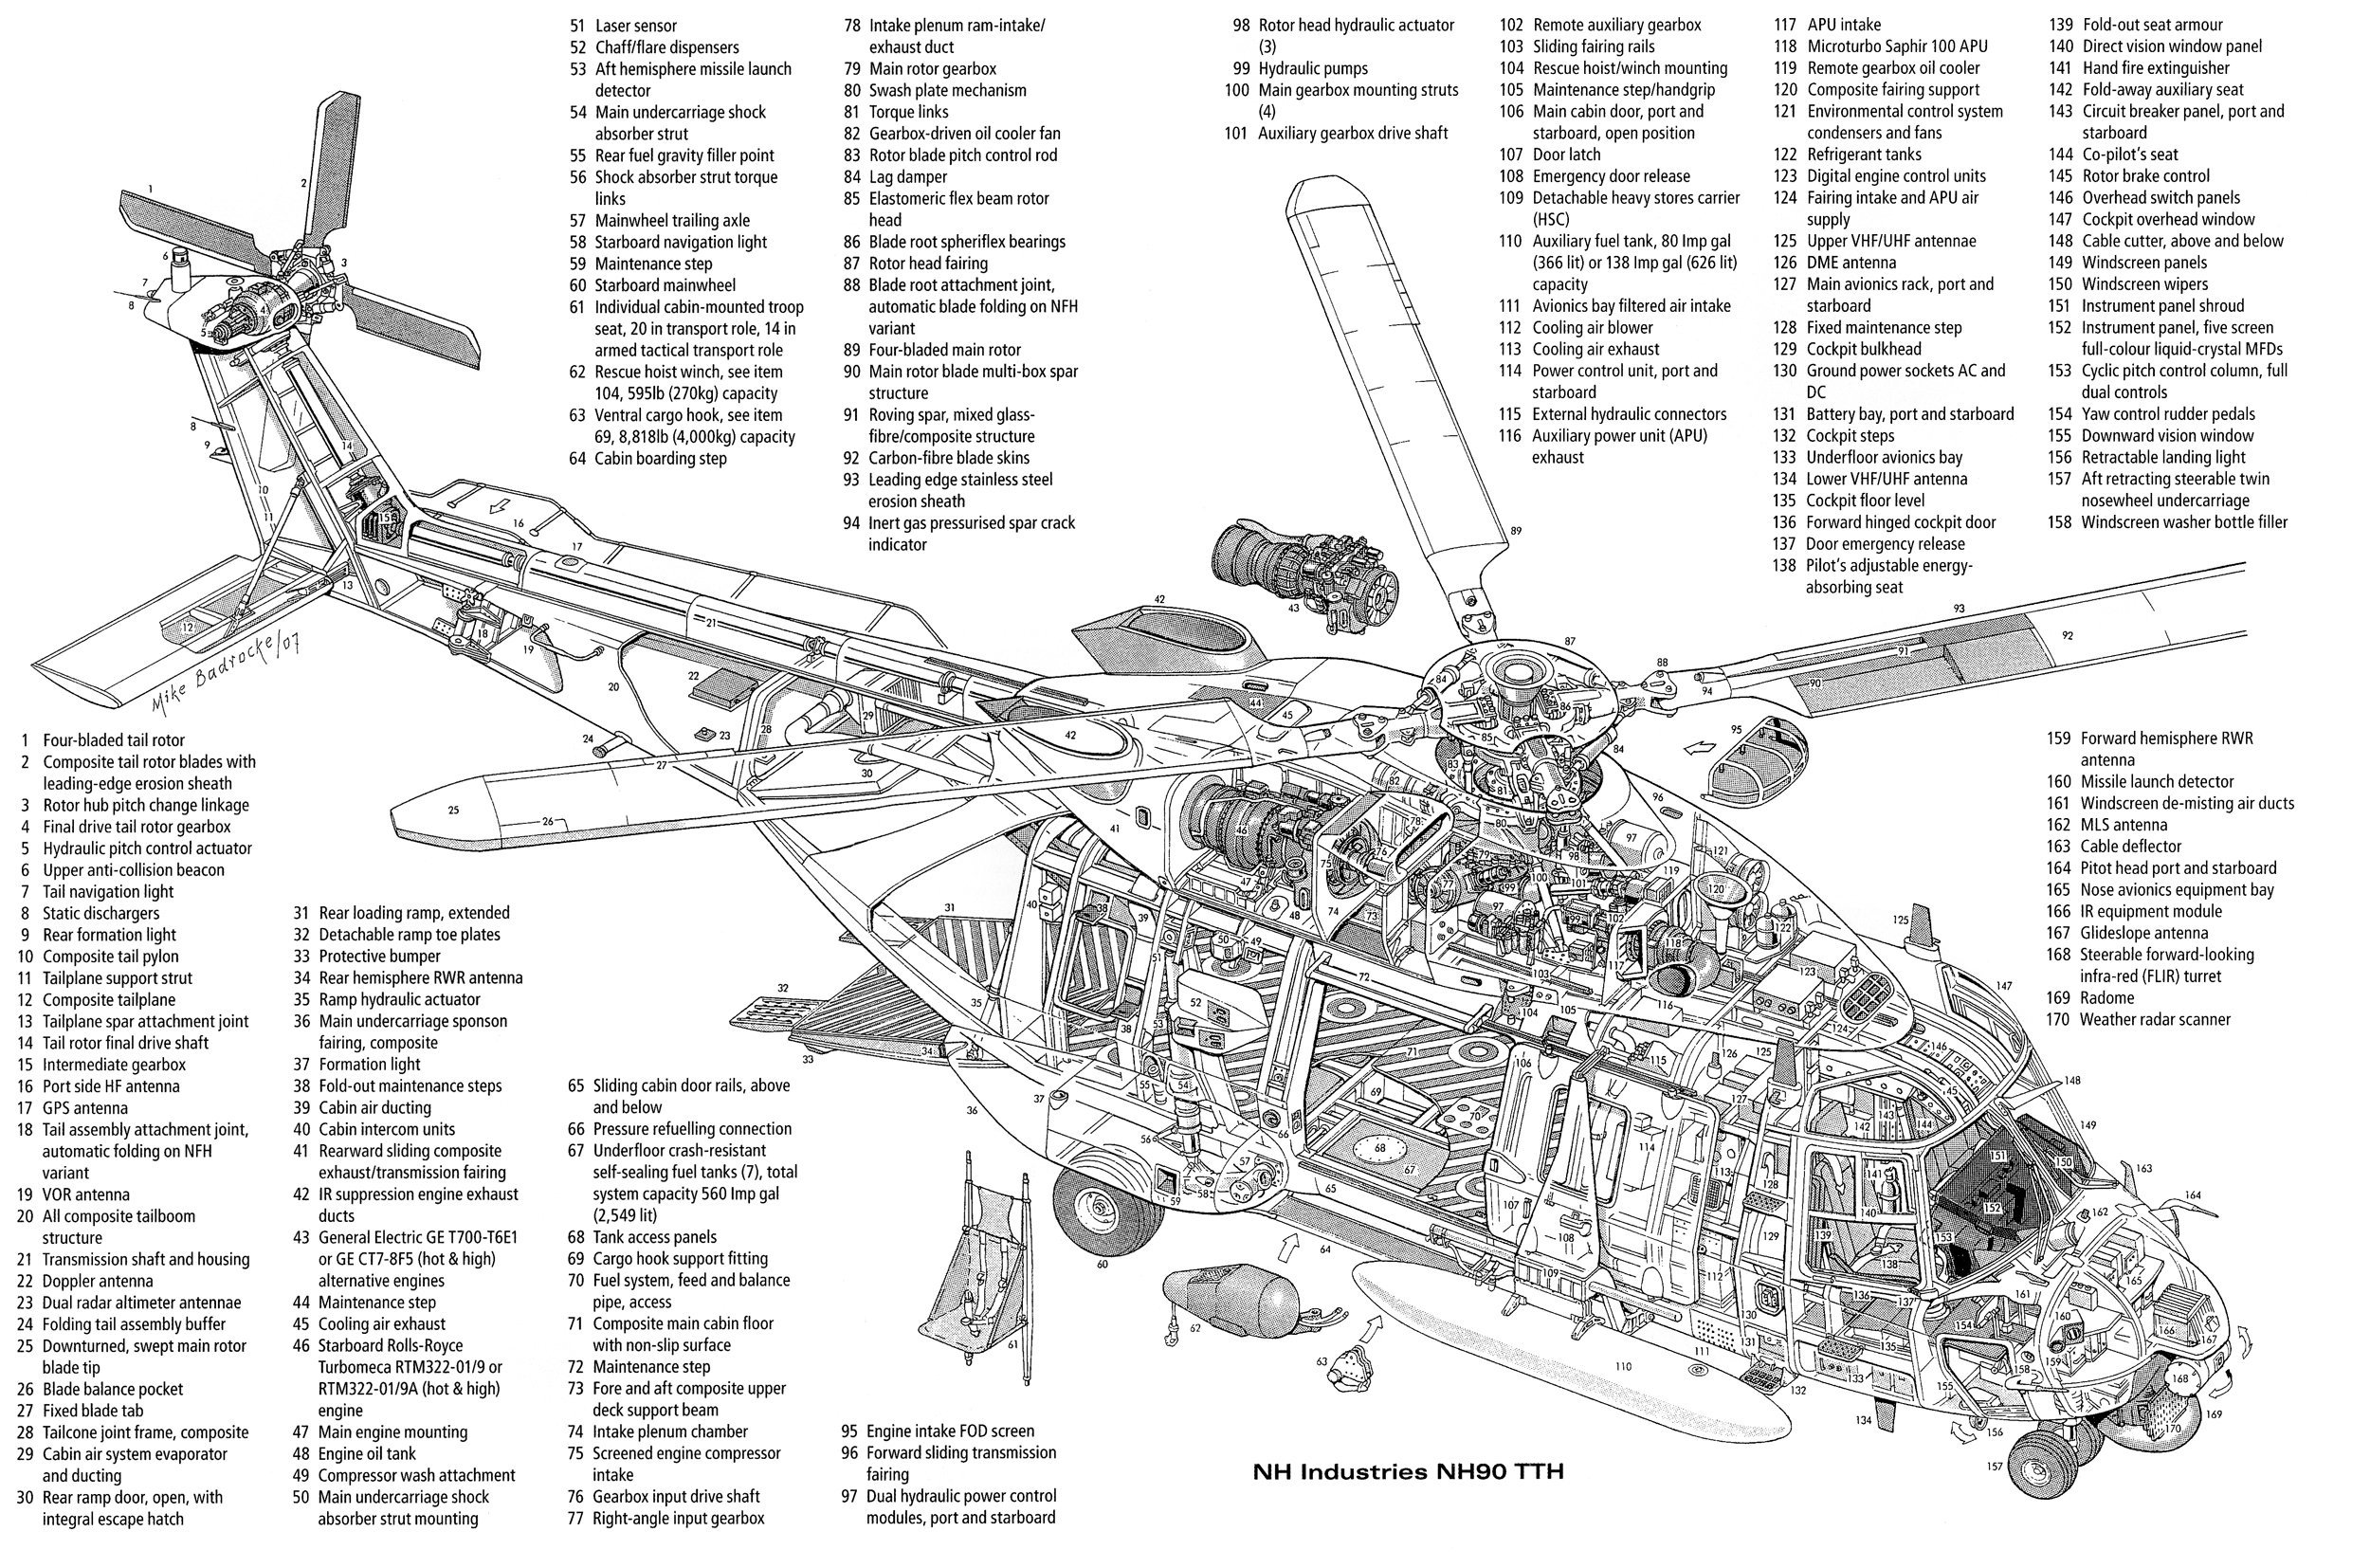 Rolls Royce Merlin Engine Diagram CFM56 Engine Diagram